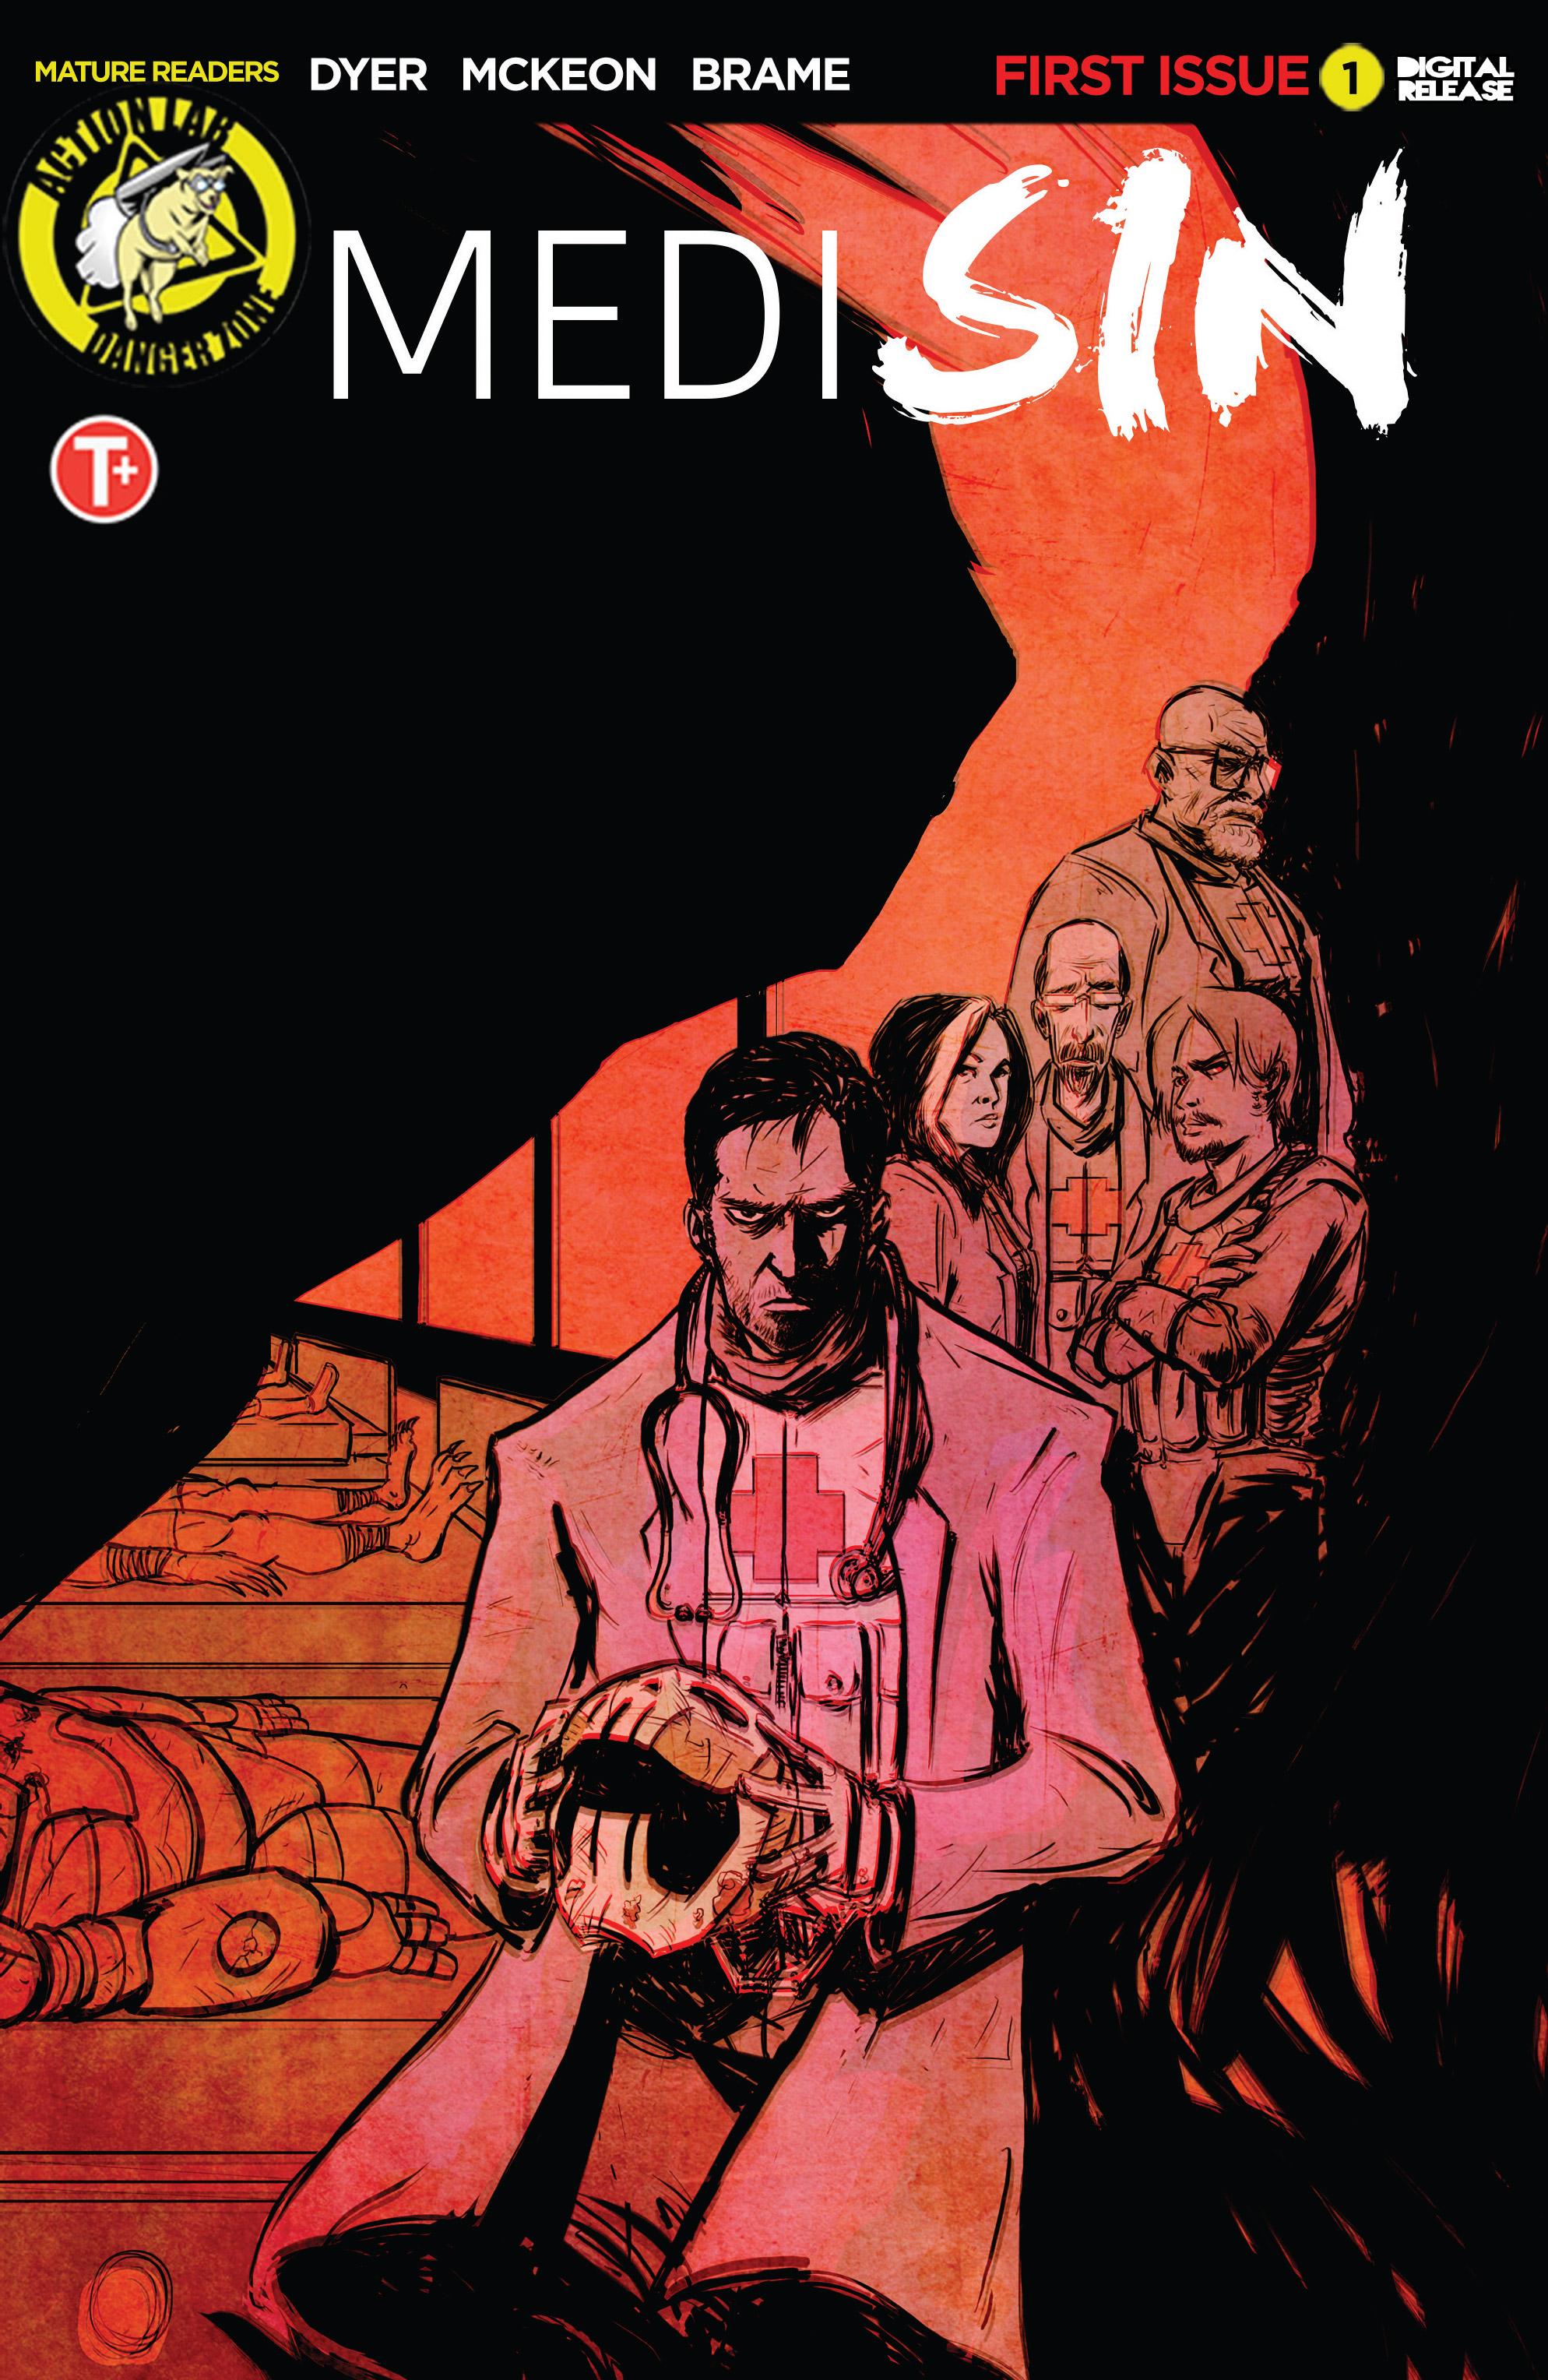 Read online Medisin comic -  Issue #1 - 1